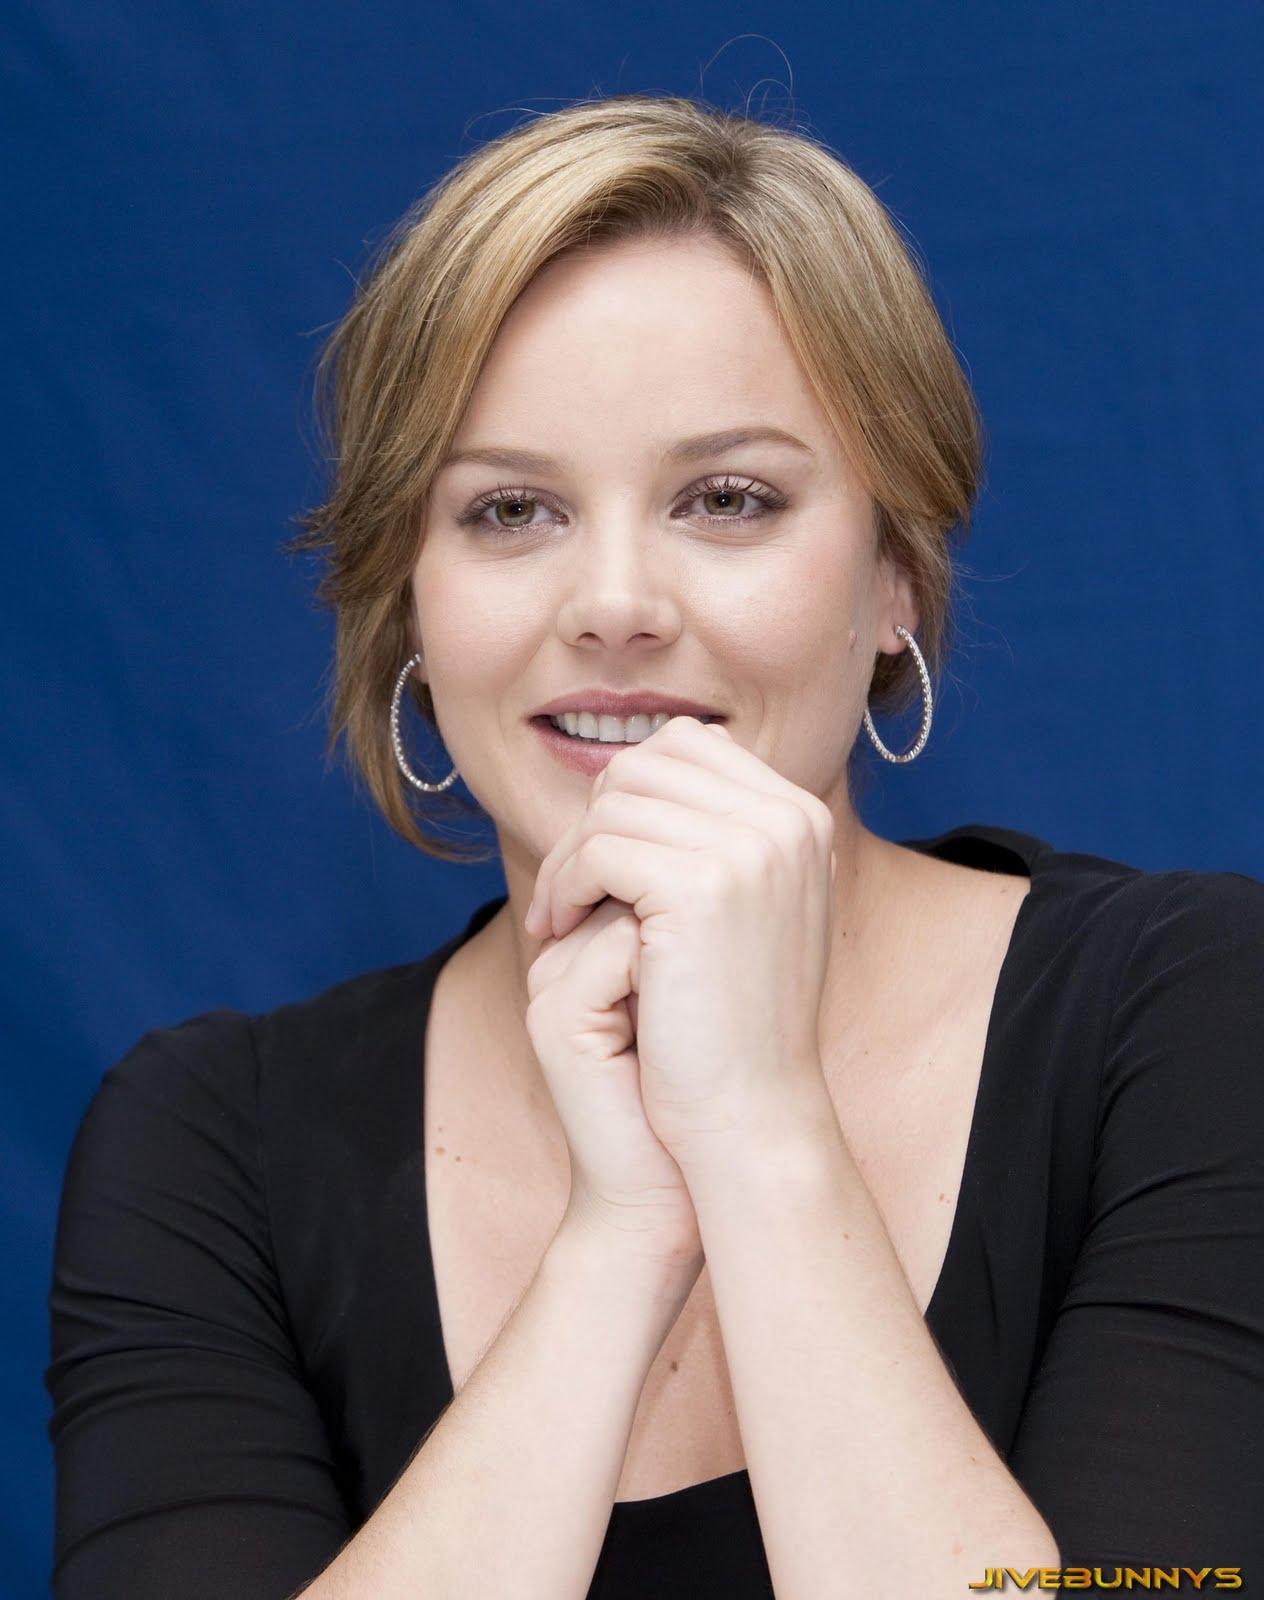 abbie-cornish-ac...Abbie Cornish Actress